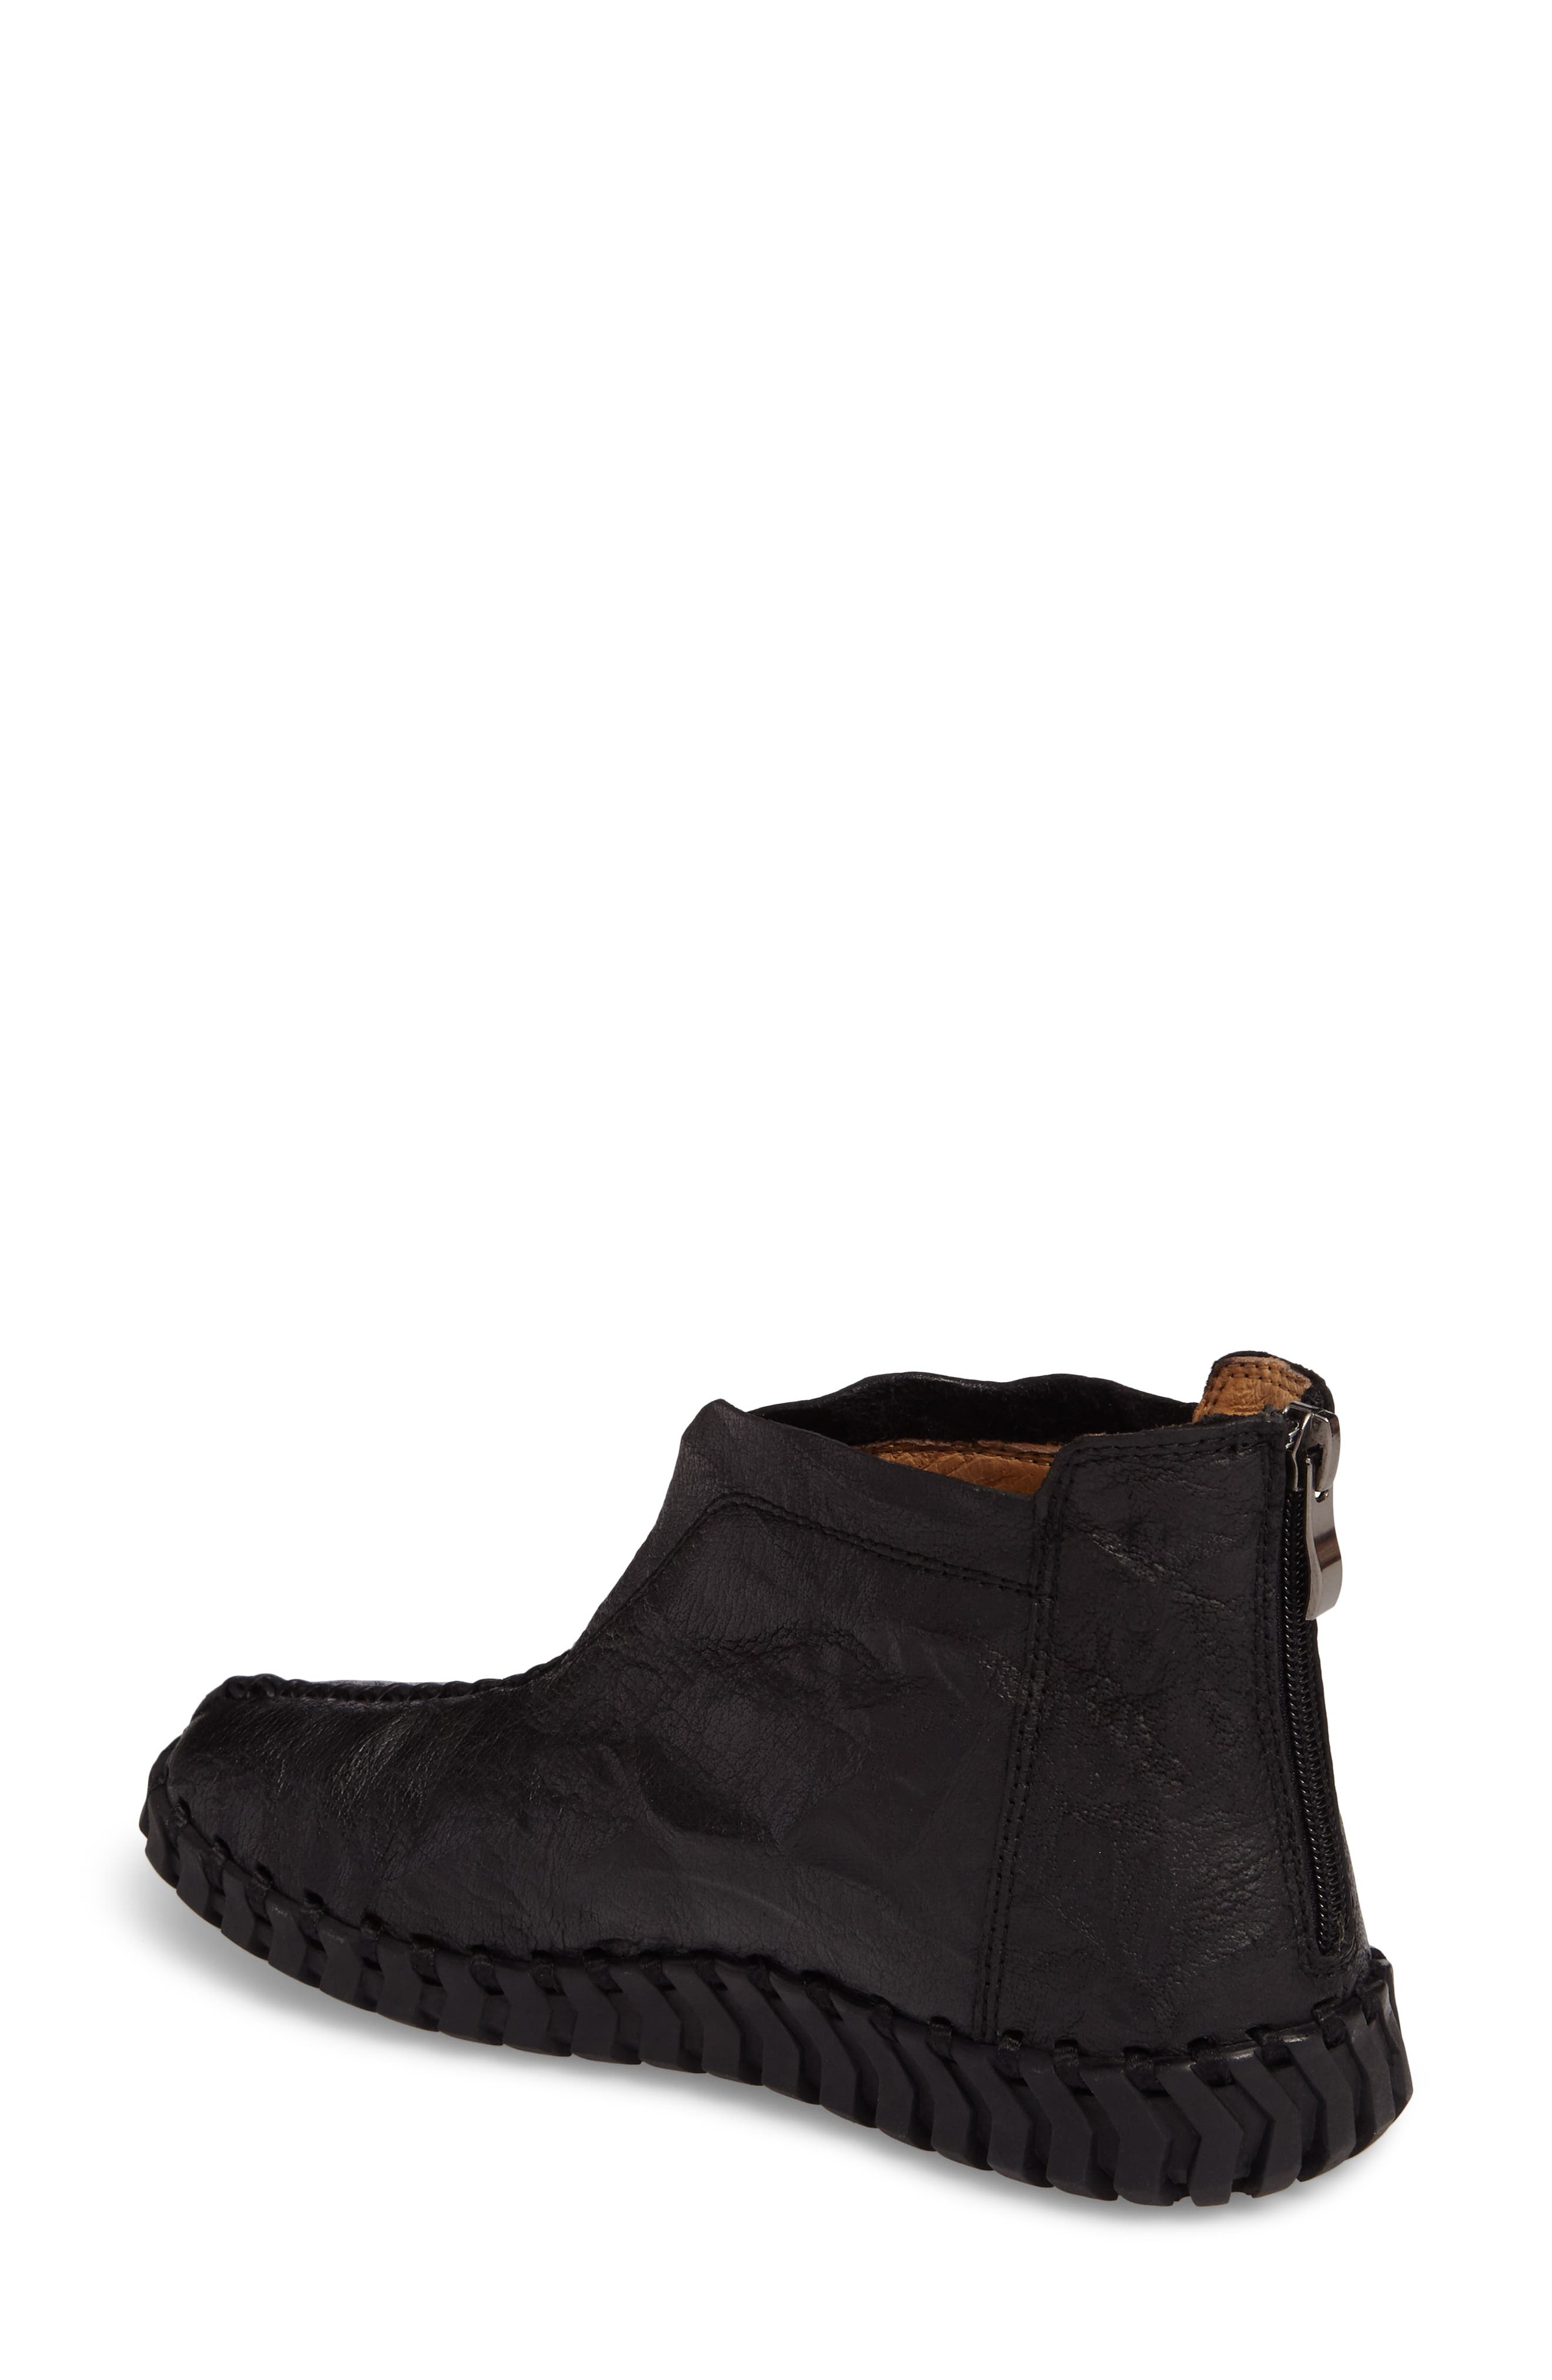 TW79 Bootie,                             Alternate thumbnail 2, color,                             Black Leather